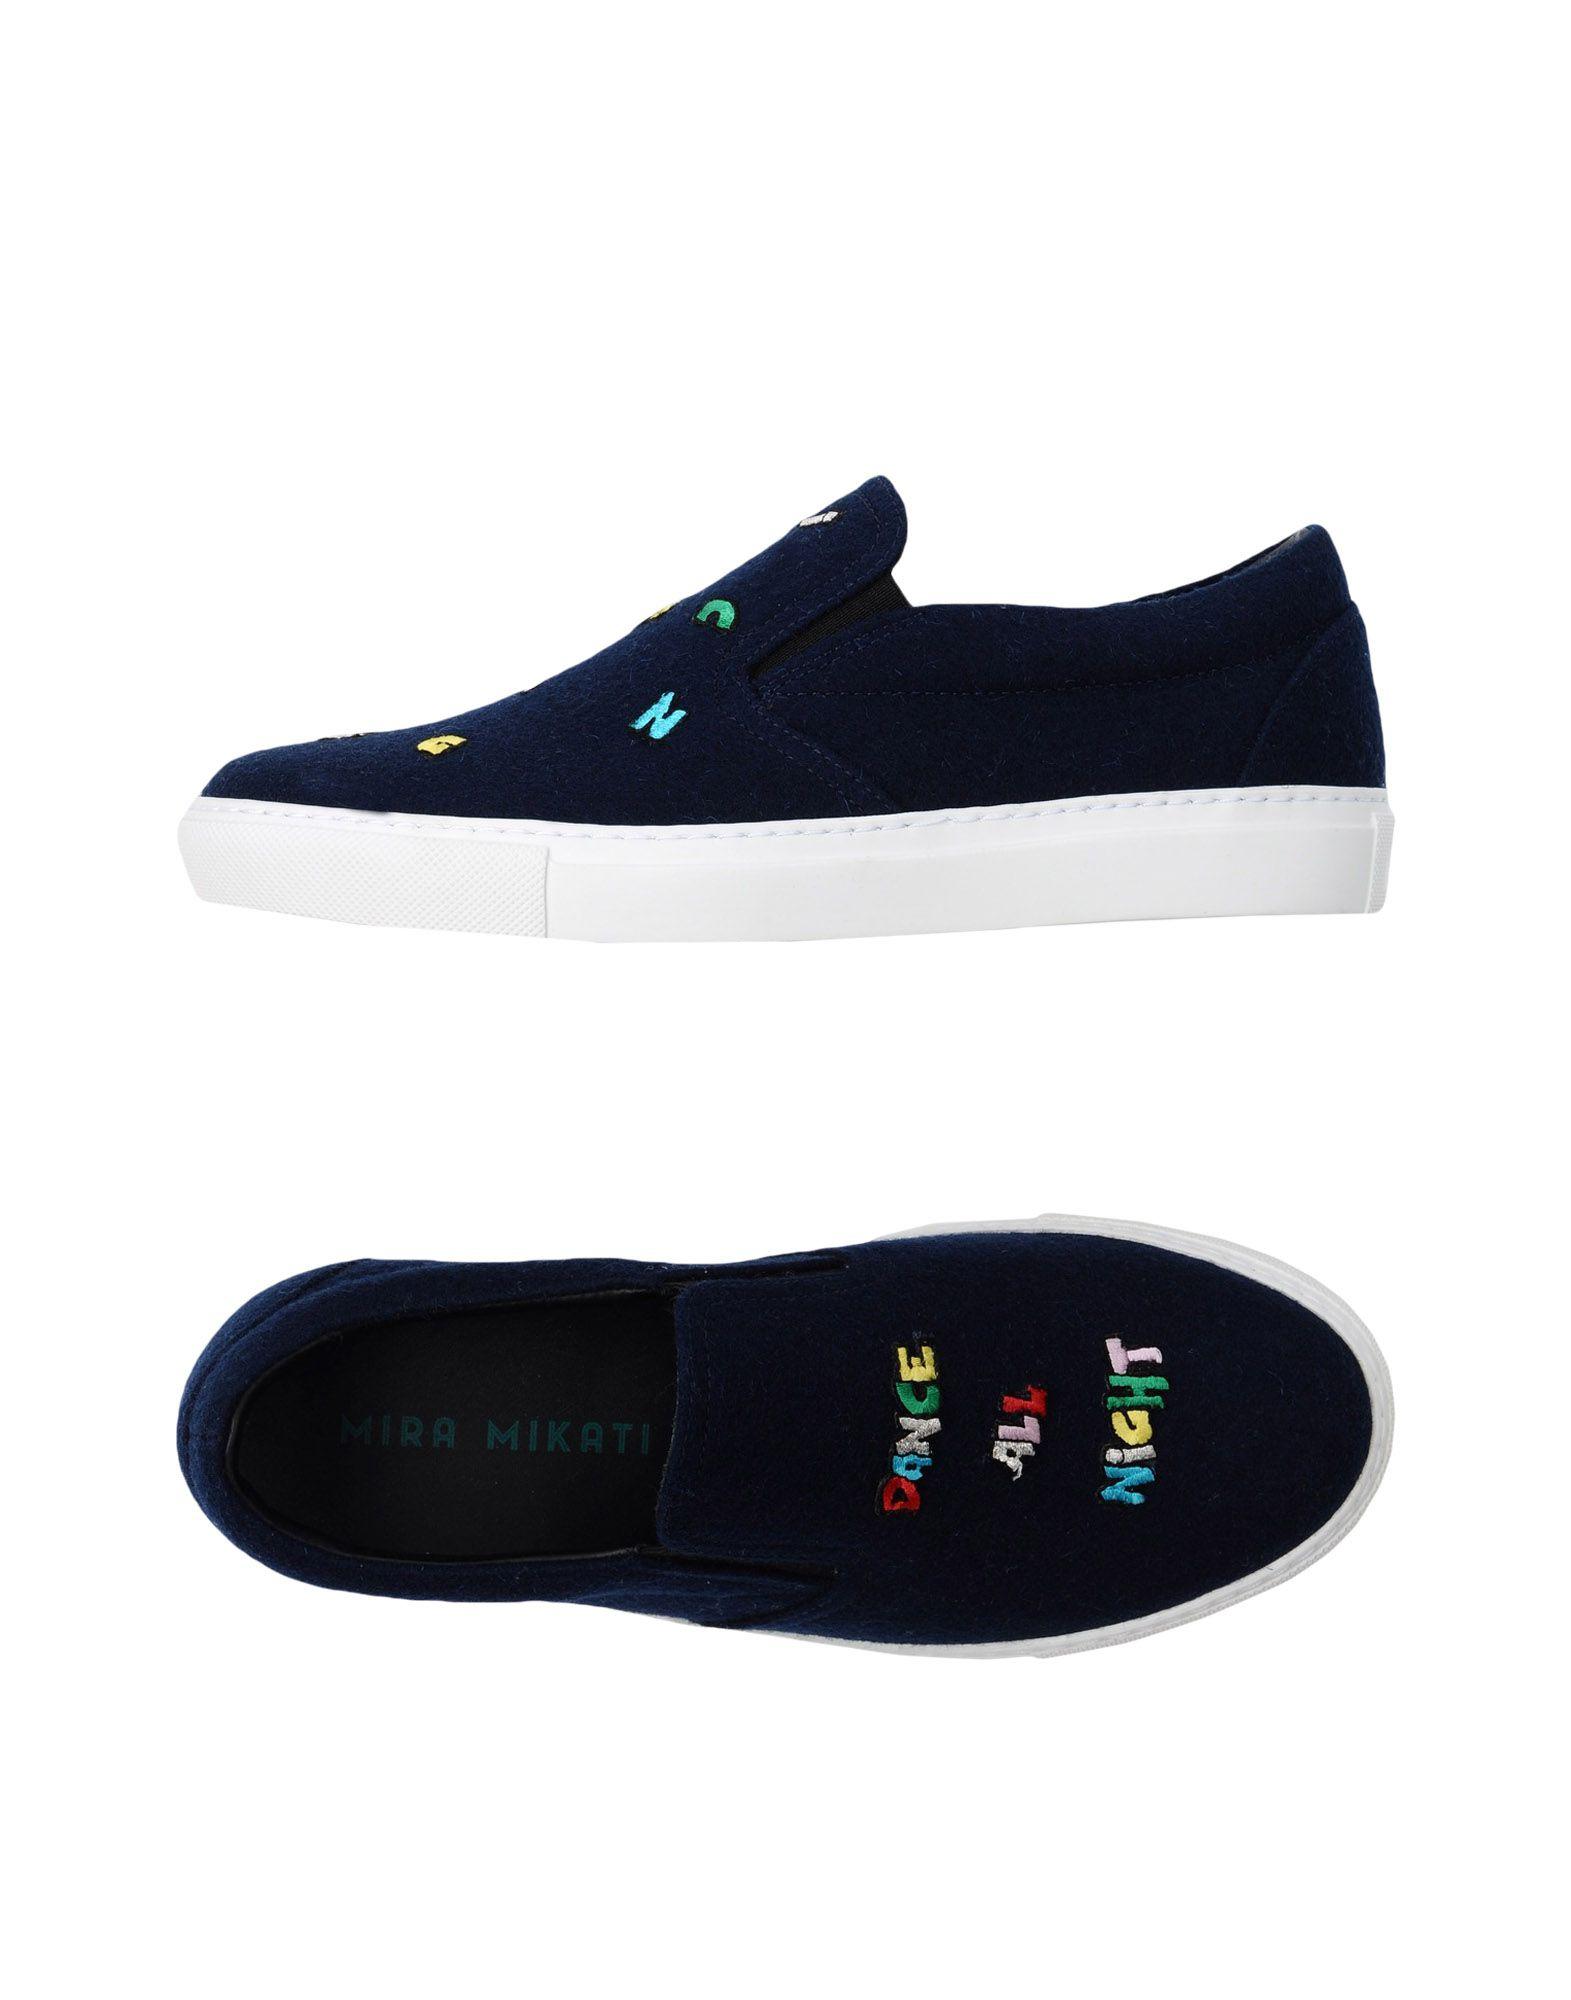 Mira Mikati Sneakers Qualität Damen  11341284HG Gute Qualität Sneakers beliebte Schuhe e7b472